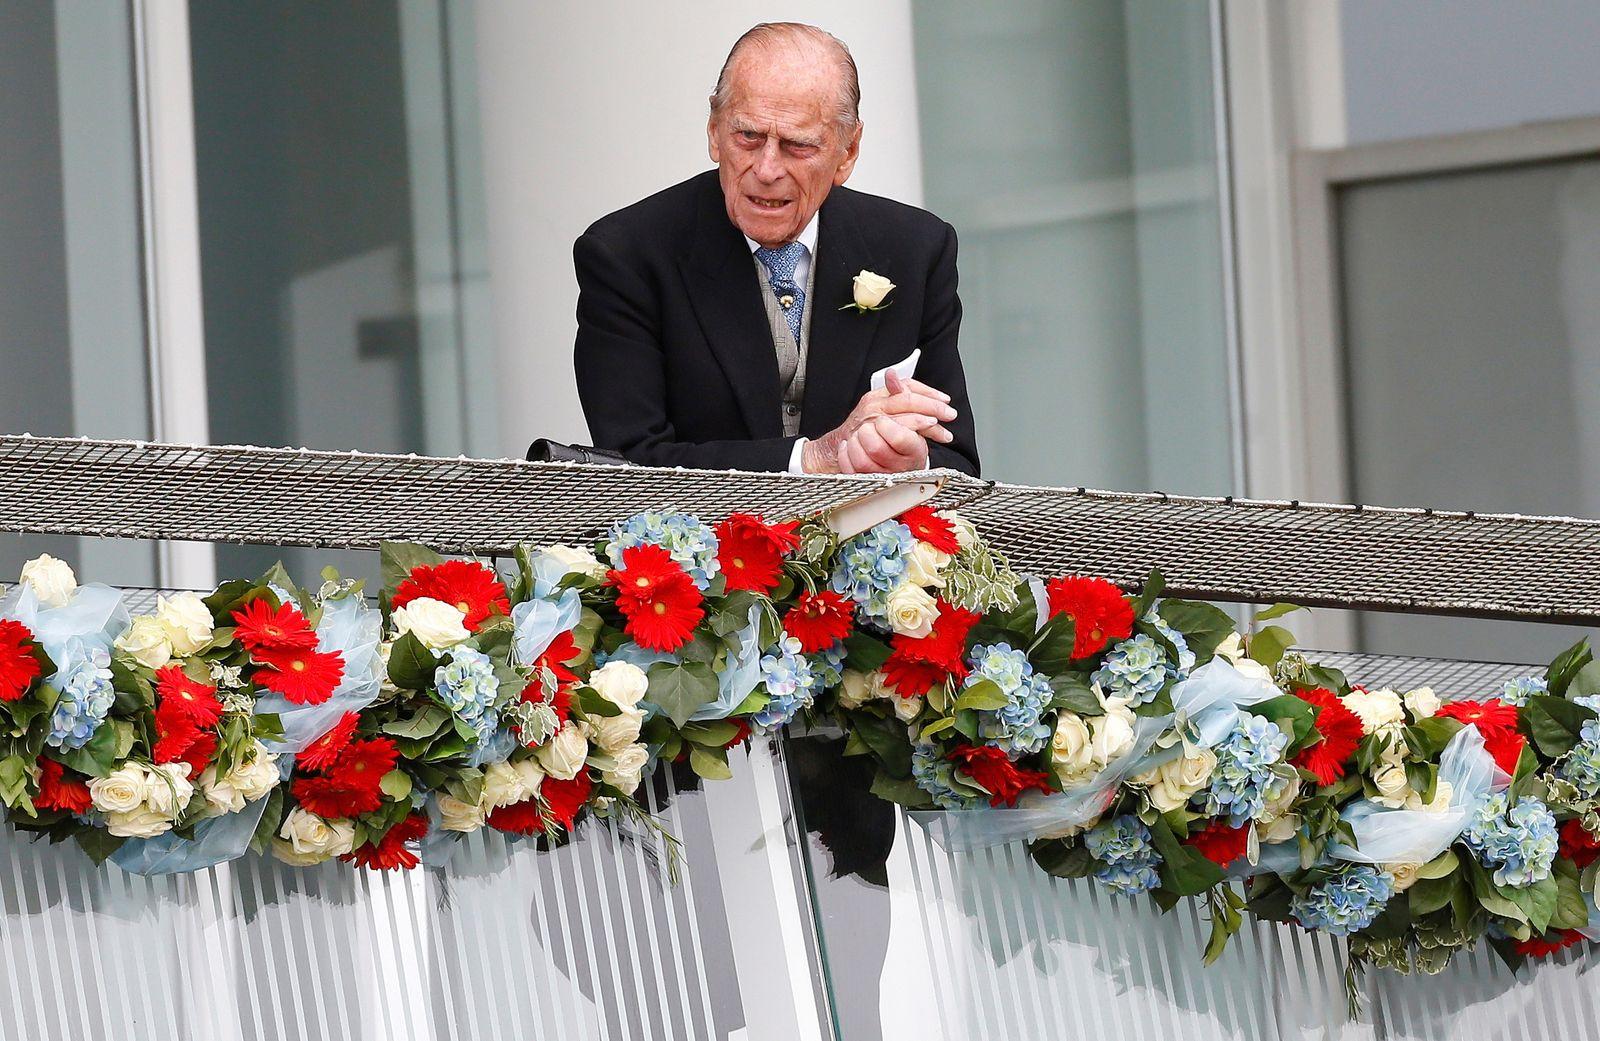 FILE PHOTO: Britain's Prince Philip, Duke of Edinburgh attends the Epsom Derby in Epsom, south of London